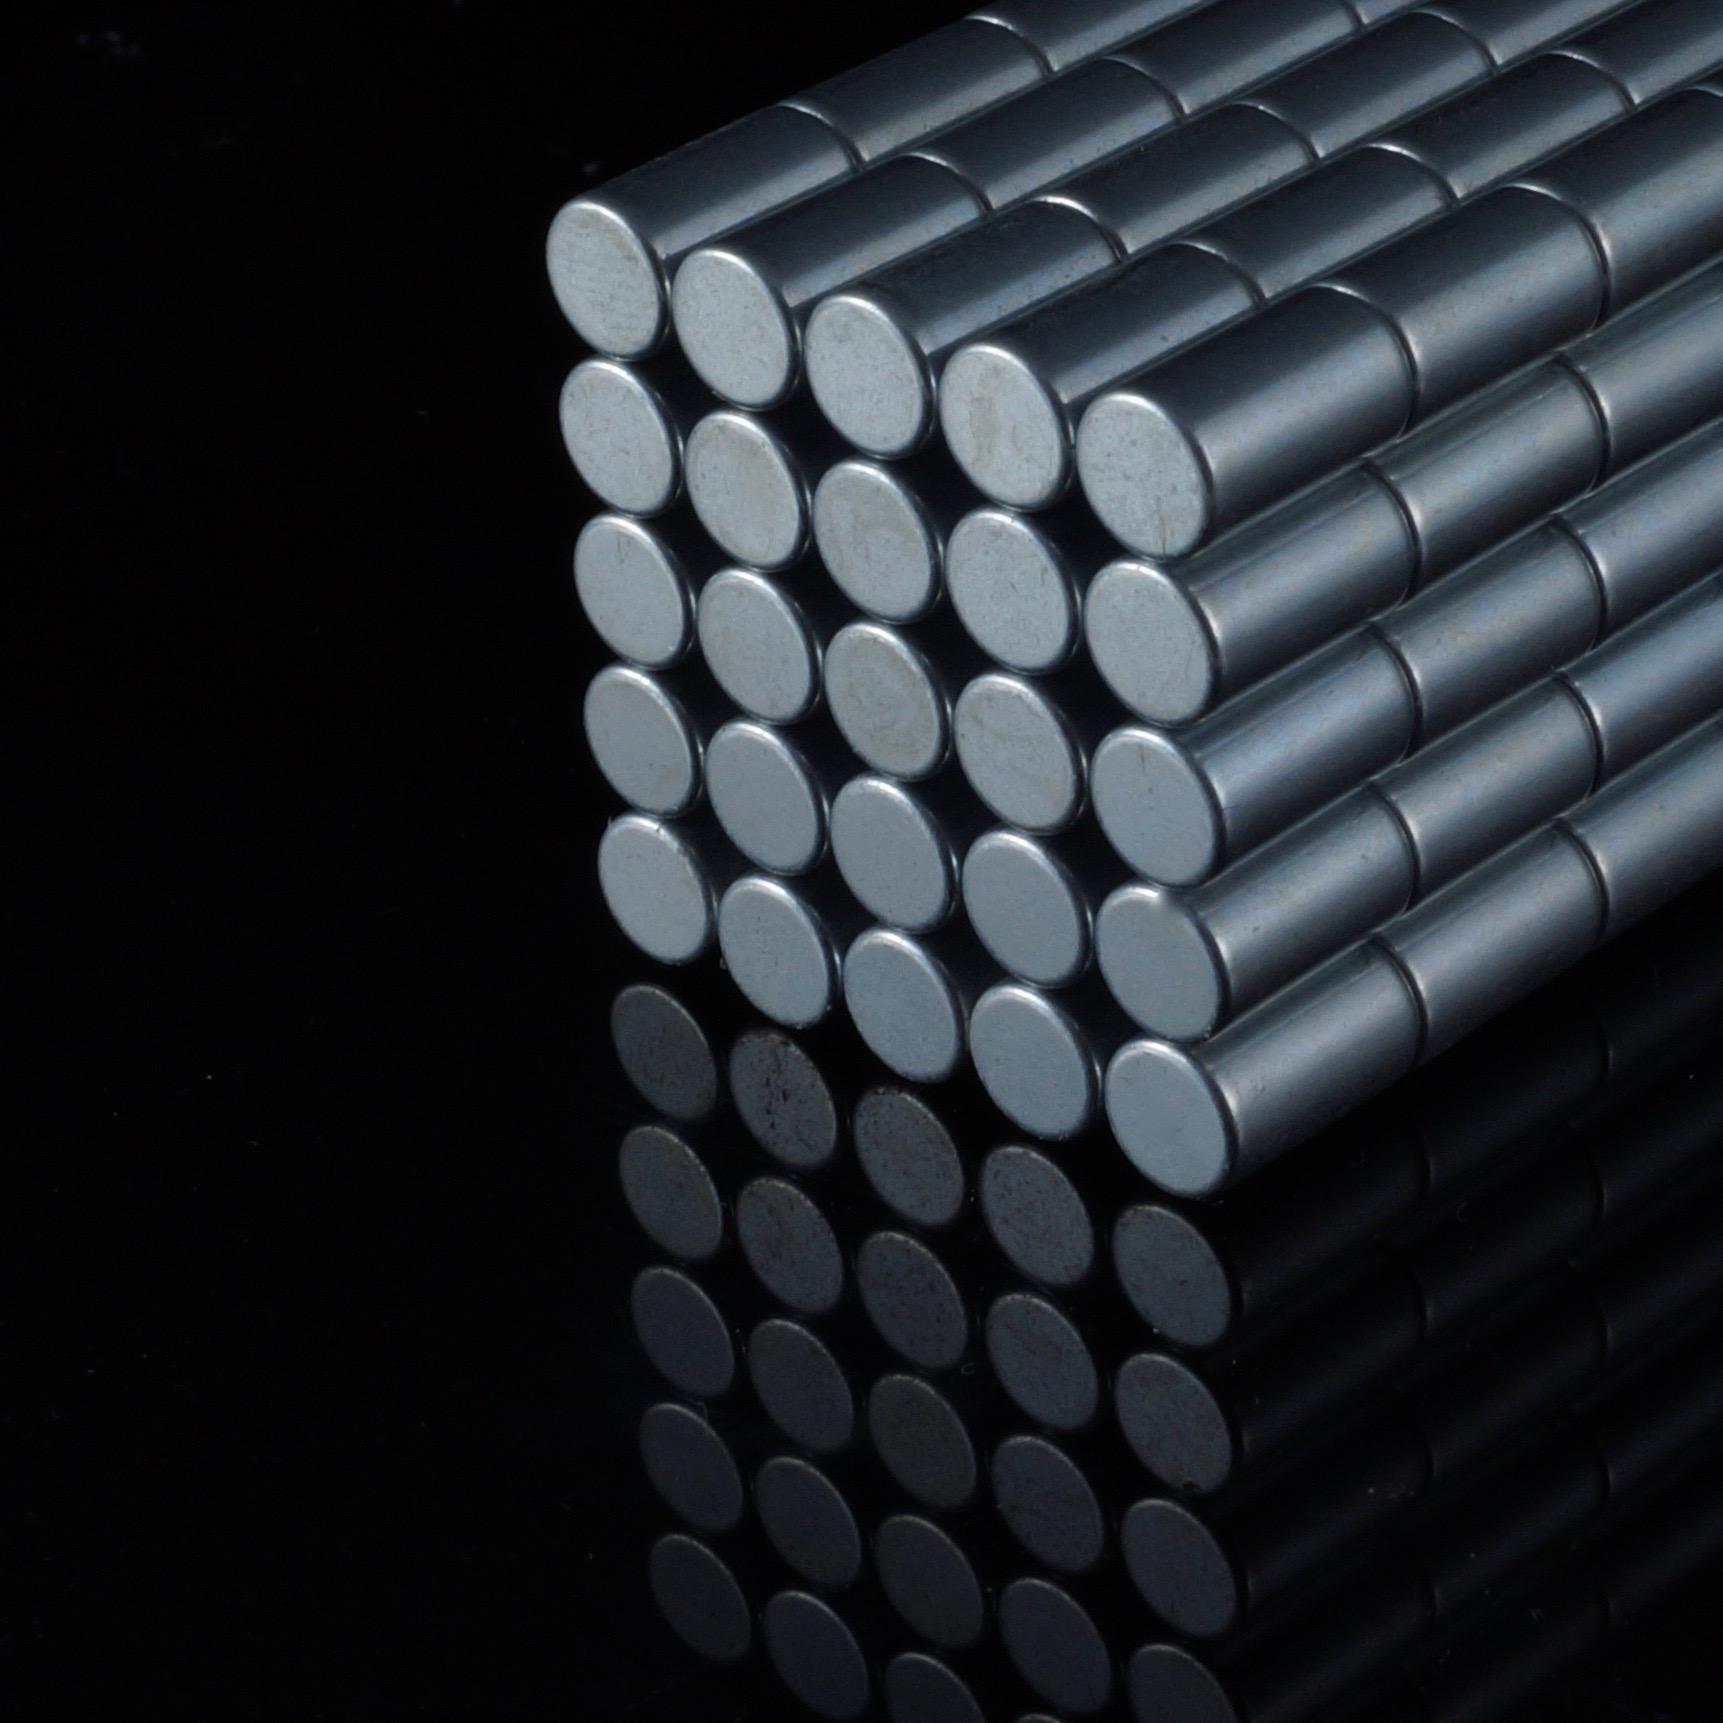 5//10//20//50//100x Neodym Stab Magnete D8x30 mm N48 5,2kg Haftkraft NdFeB rund